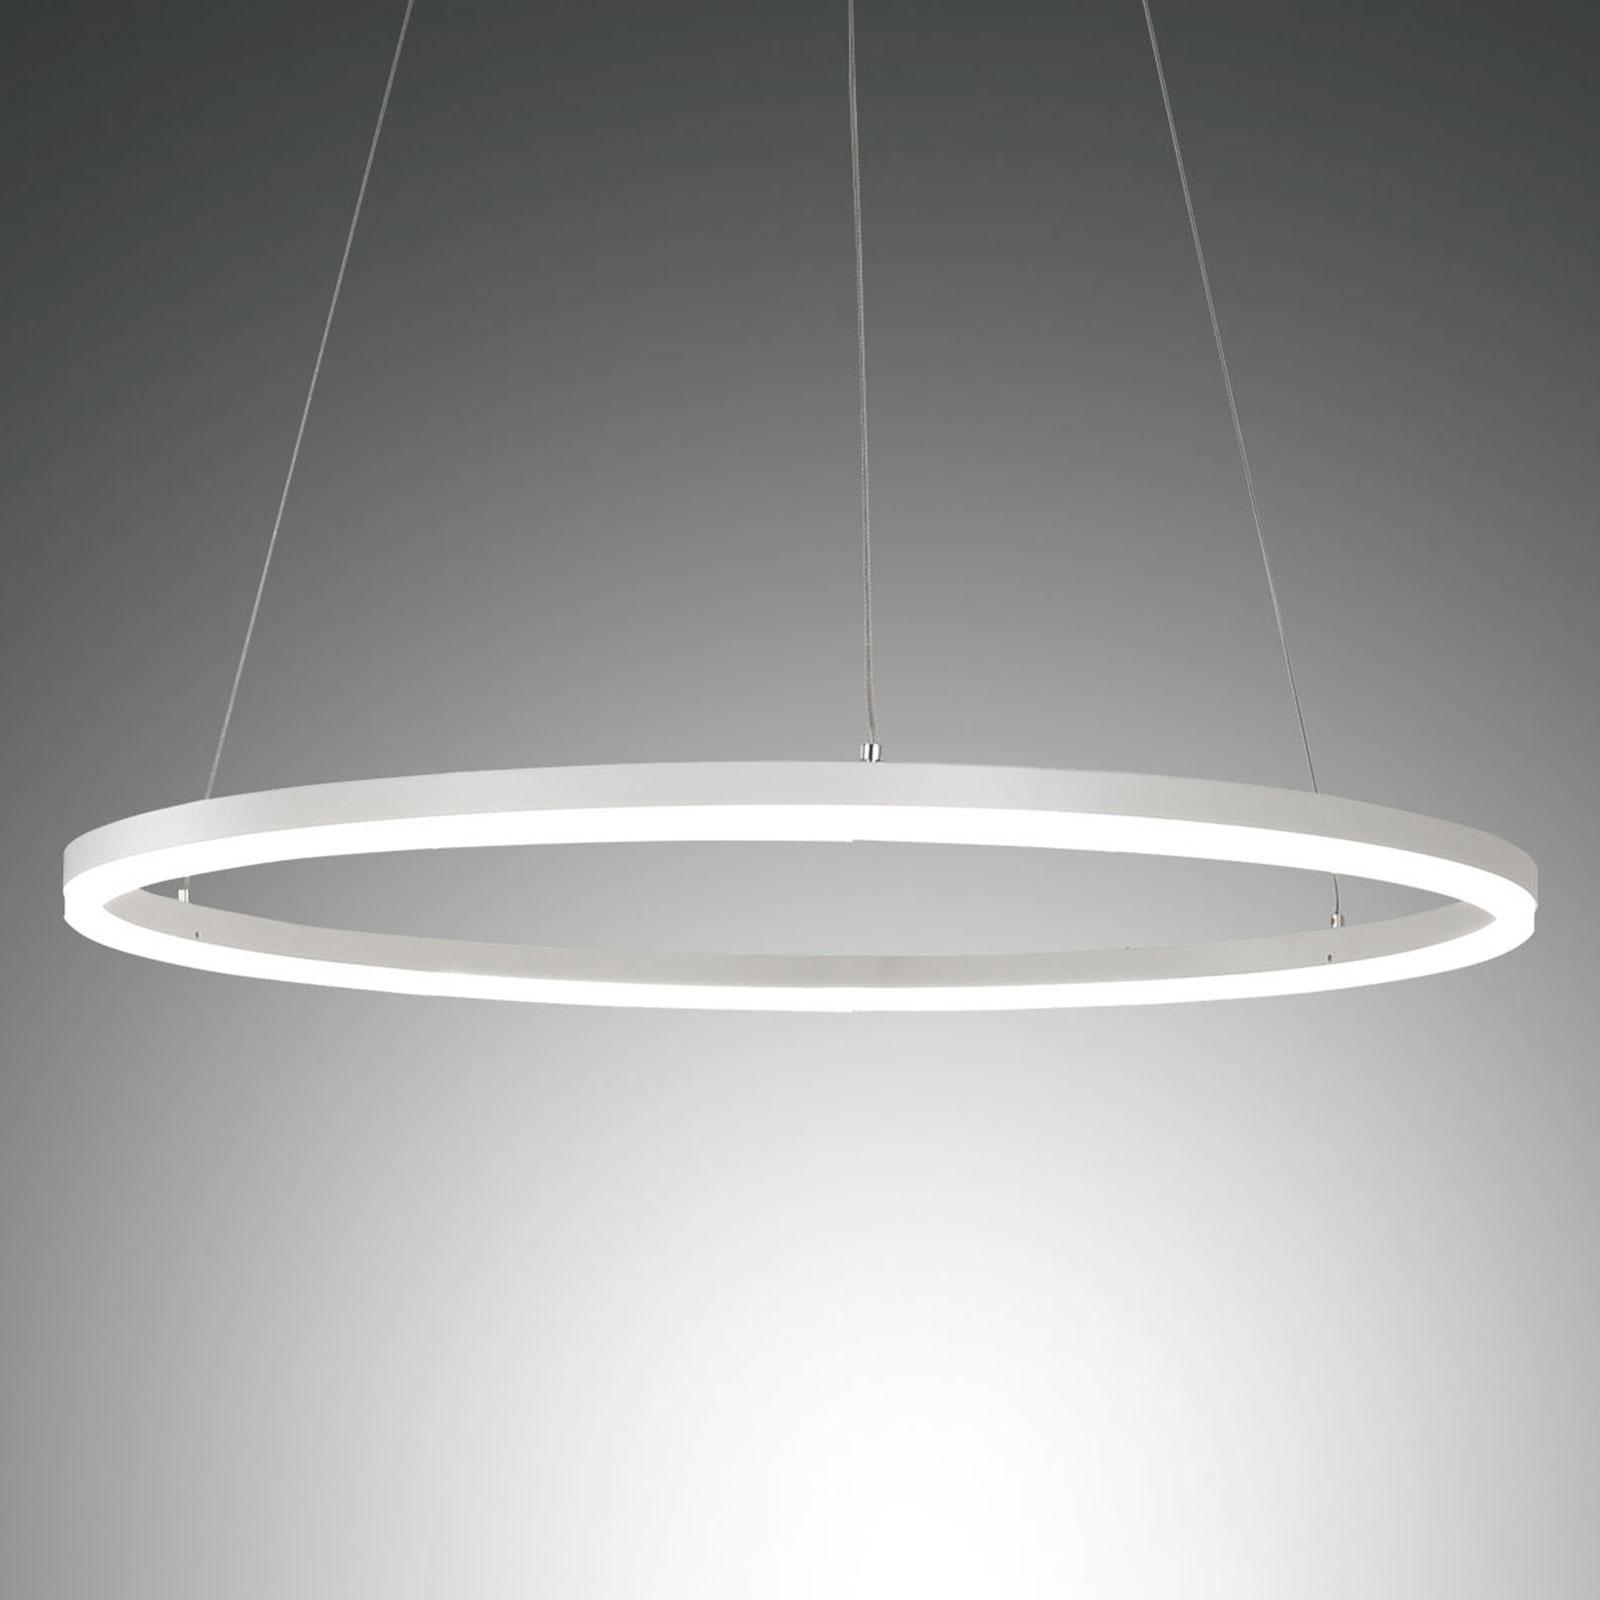 LED Pendelleuchte Giotto, einflammig, weiß